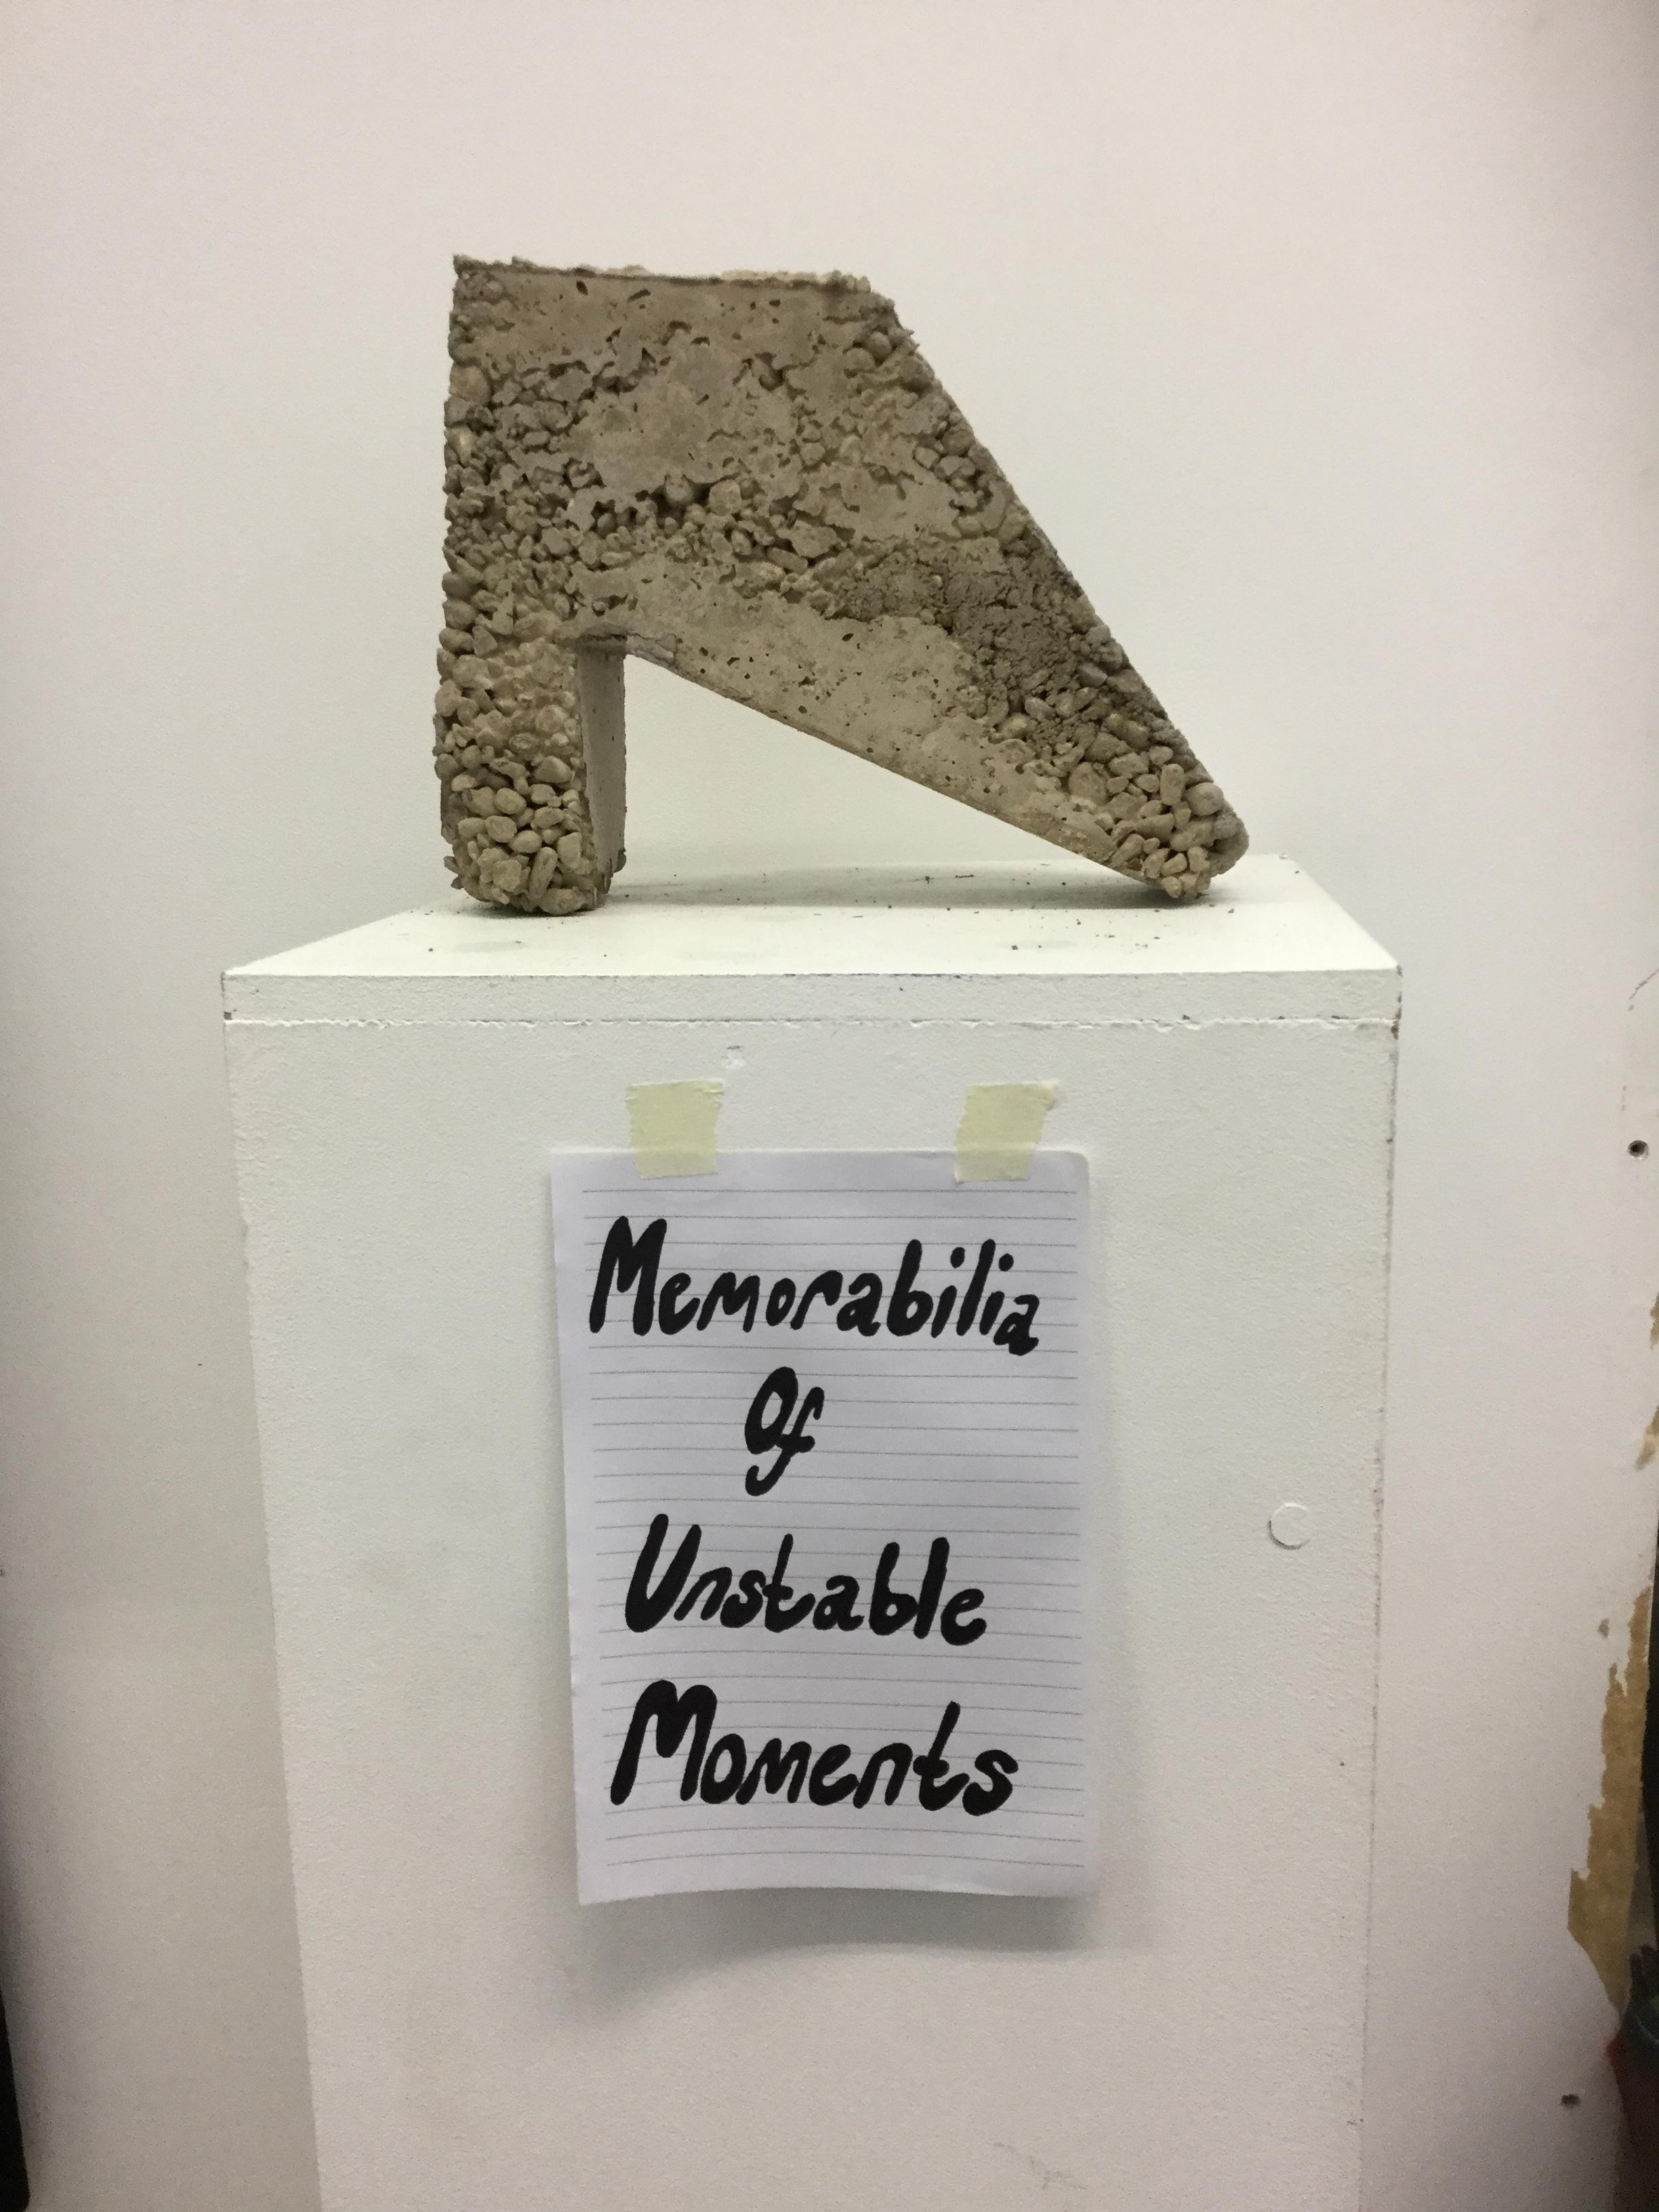 memorabilia of unstable moments. concrete and handwritten note. 2019